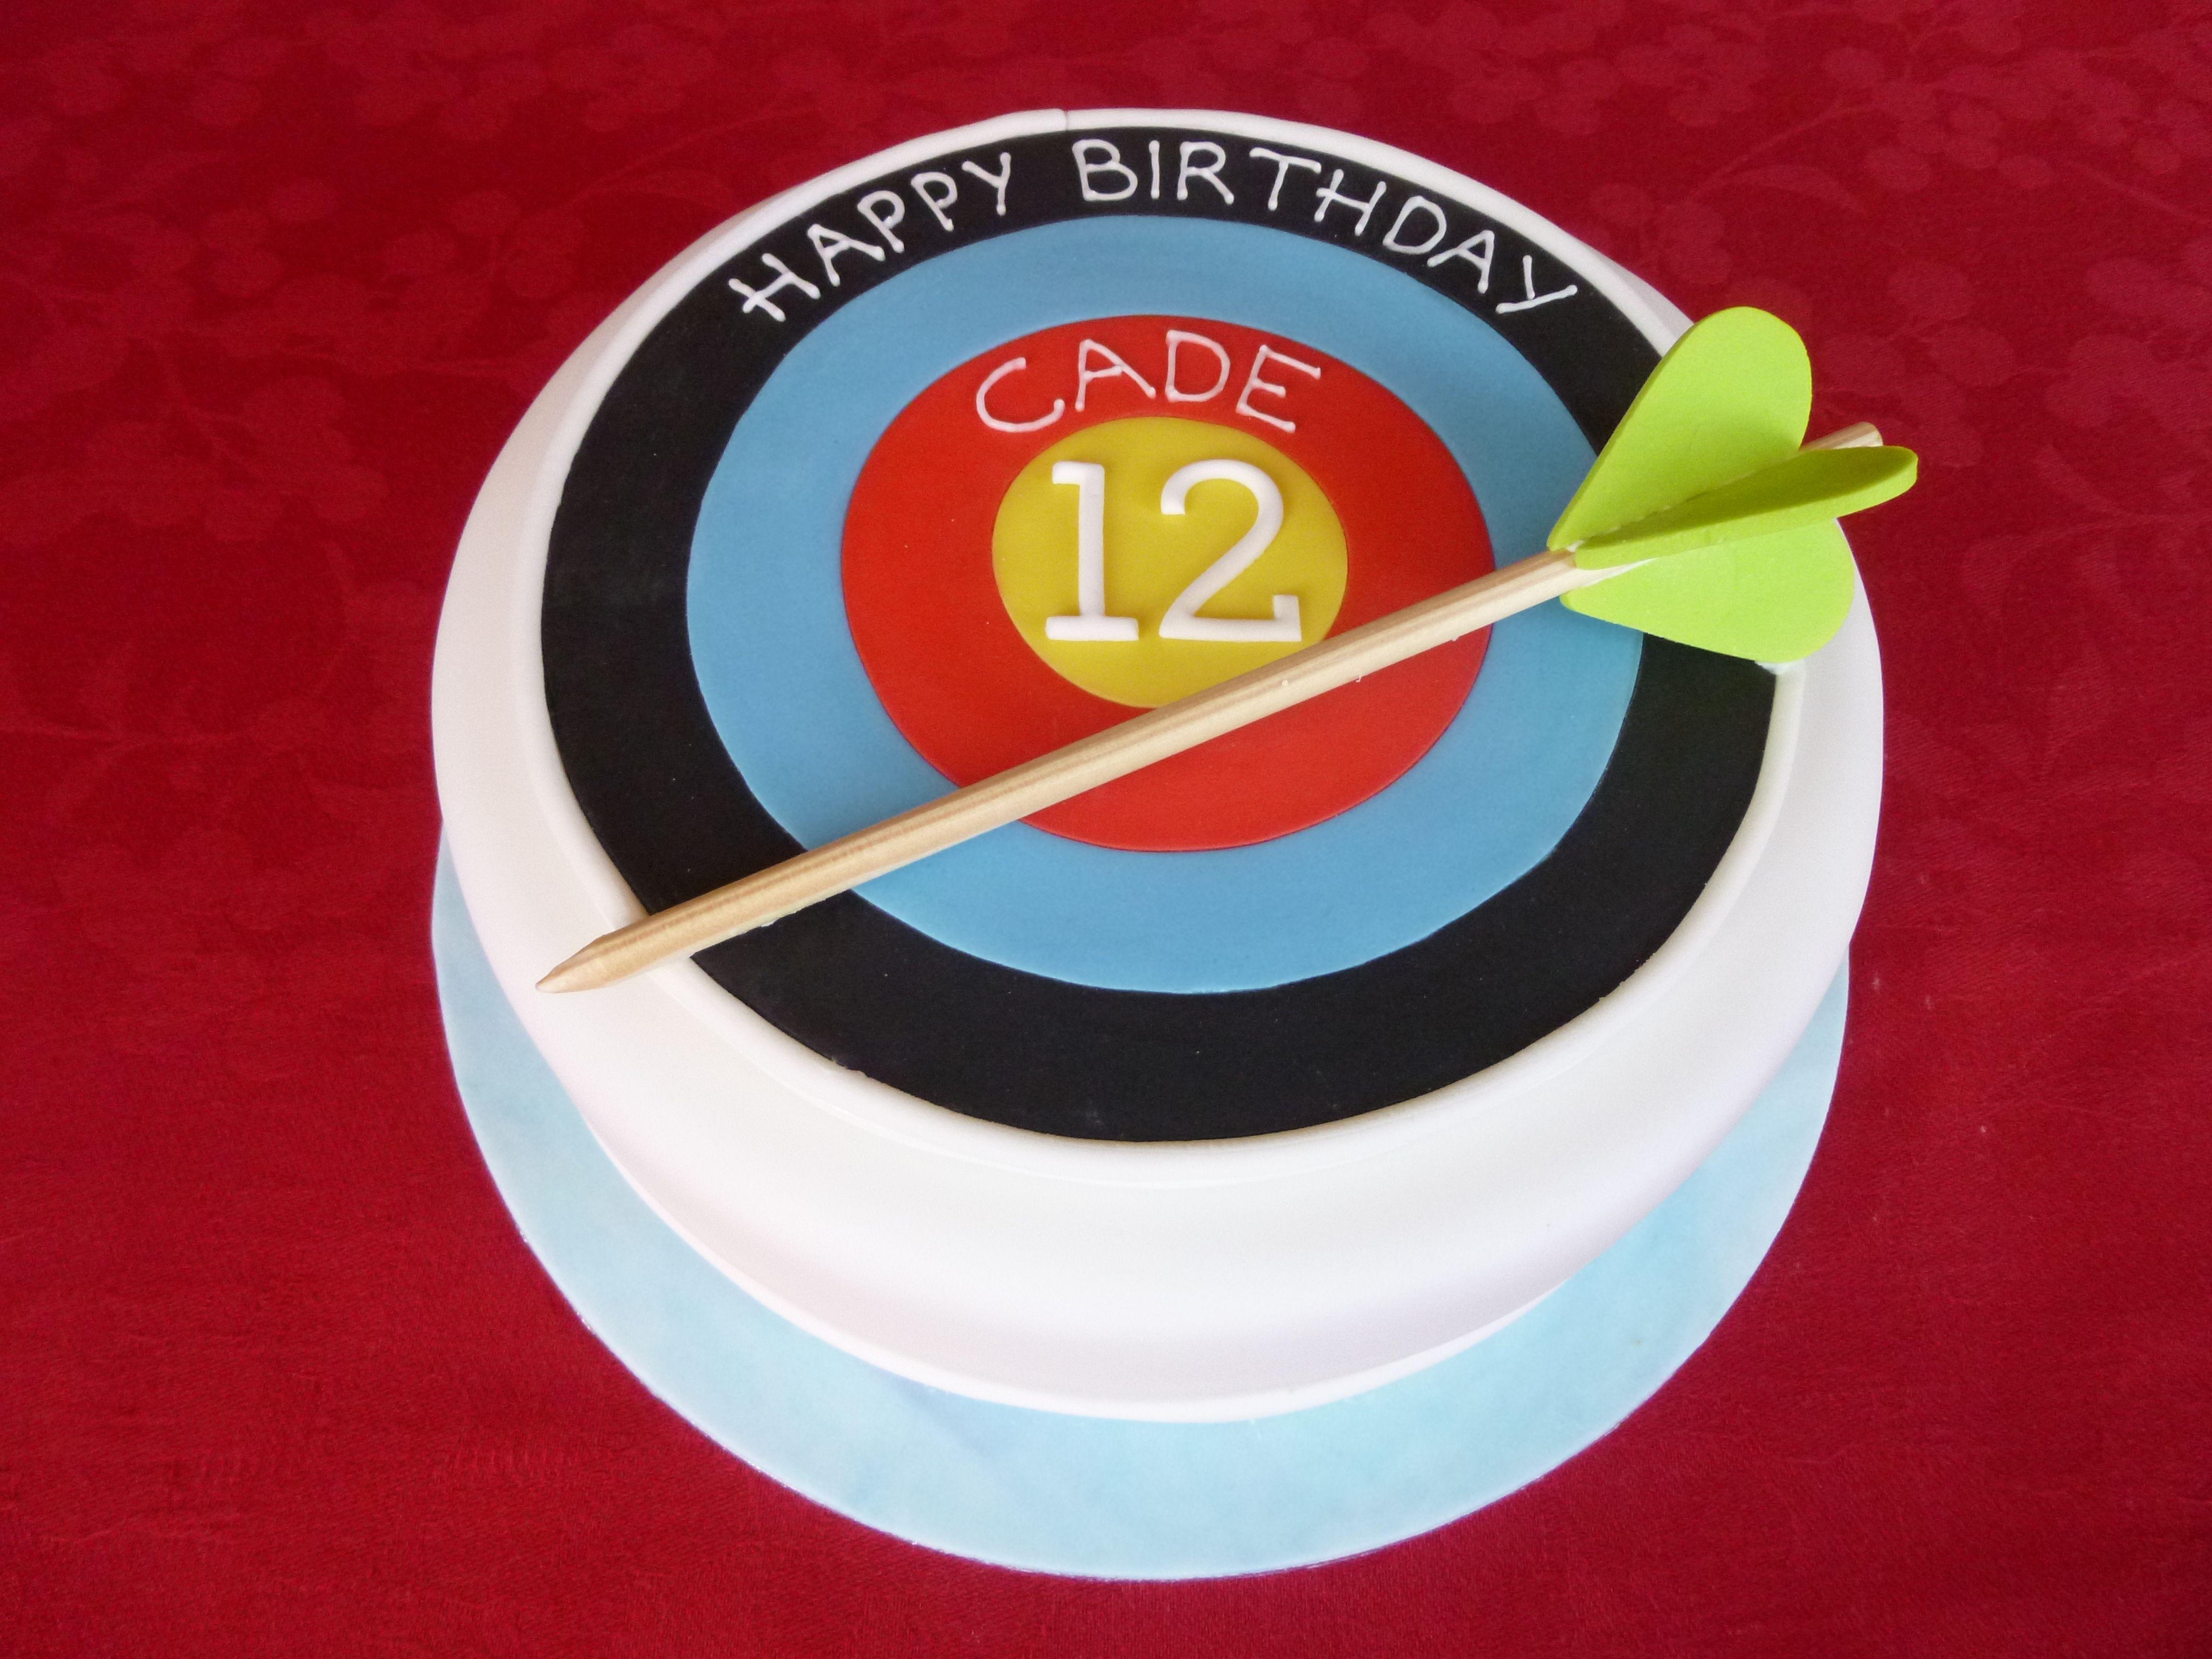 Archery Target Birthday Cake let them eat cake Pinterest